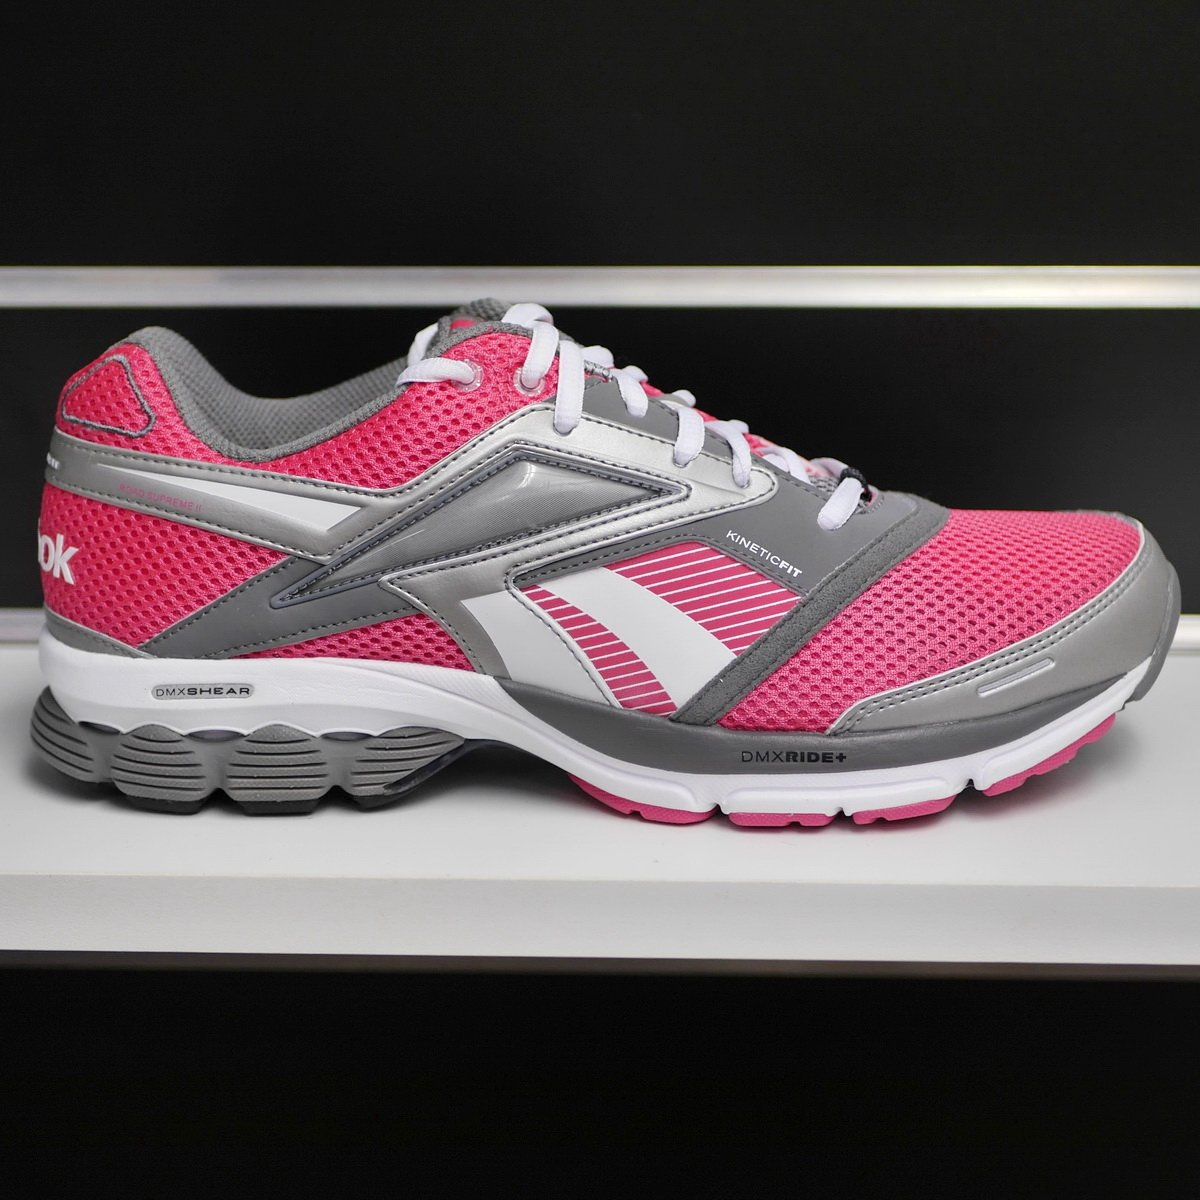 Damskie buty biegowe REEBOK Premier Road Supreme